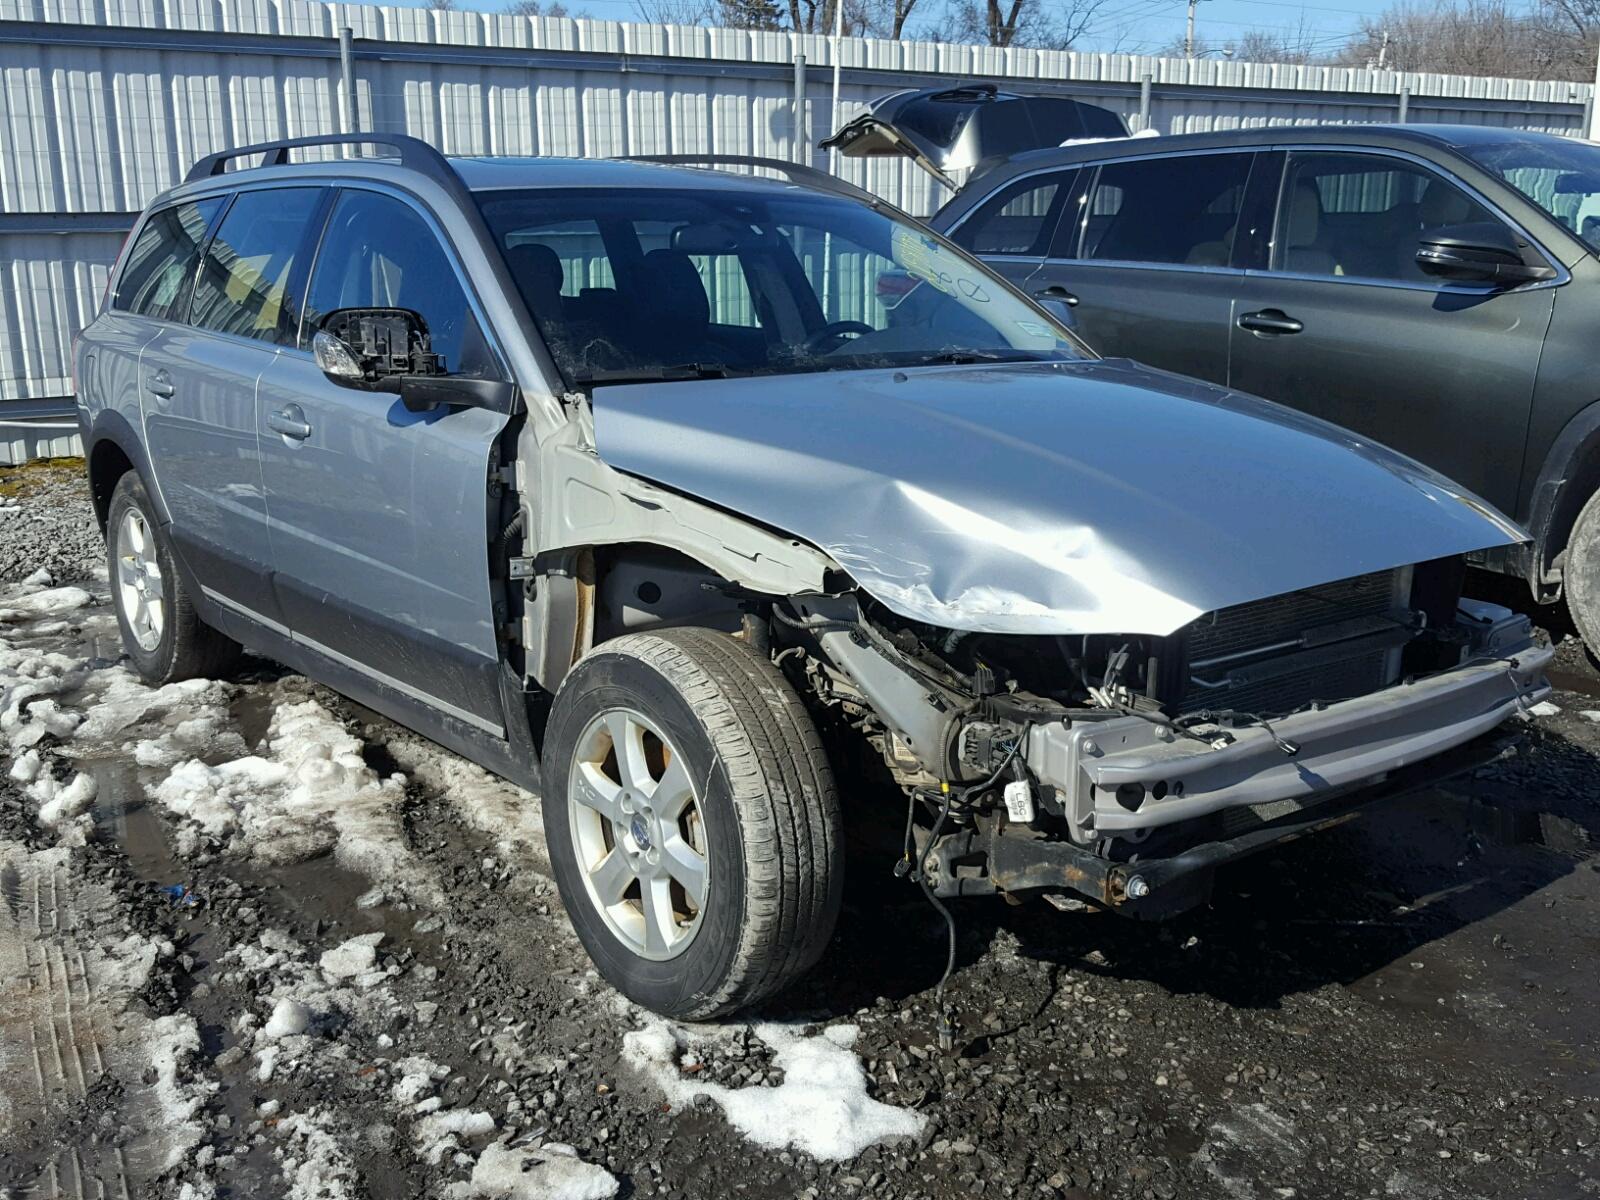 Auto Auction Ended On Vin Yv1vw27534f103573 2004 Volvo V40 In Ca V4 0 Wagon 2010 Xc70 32 32l